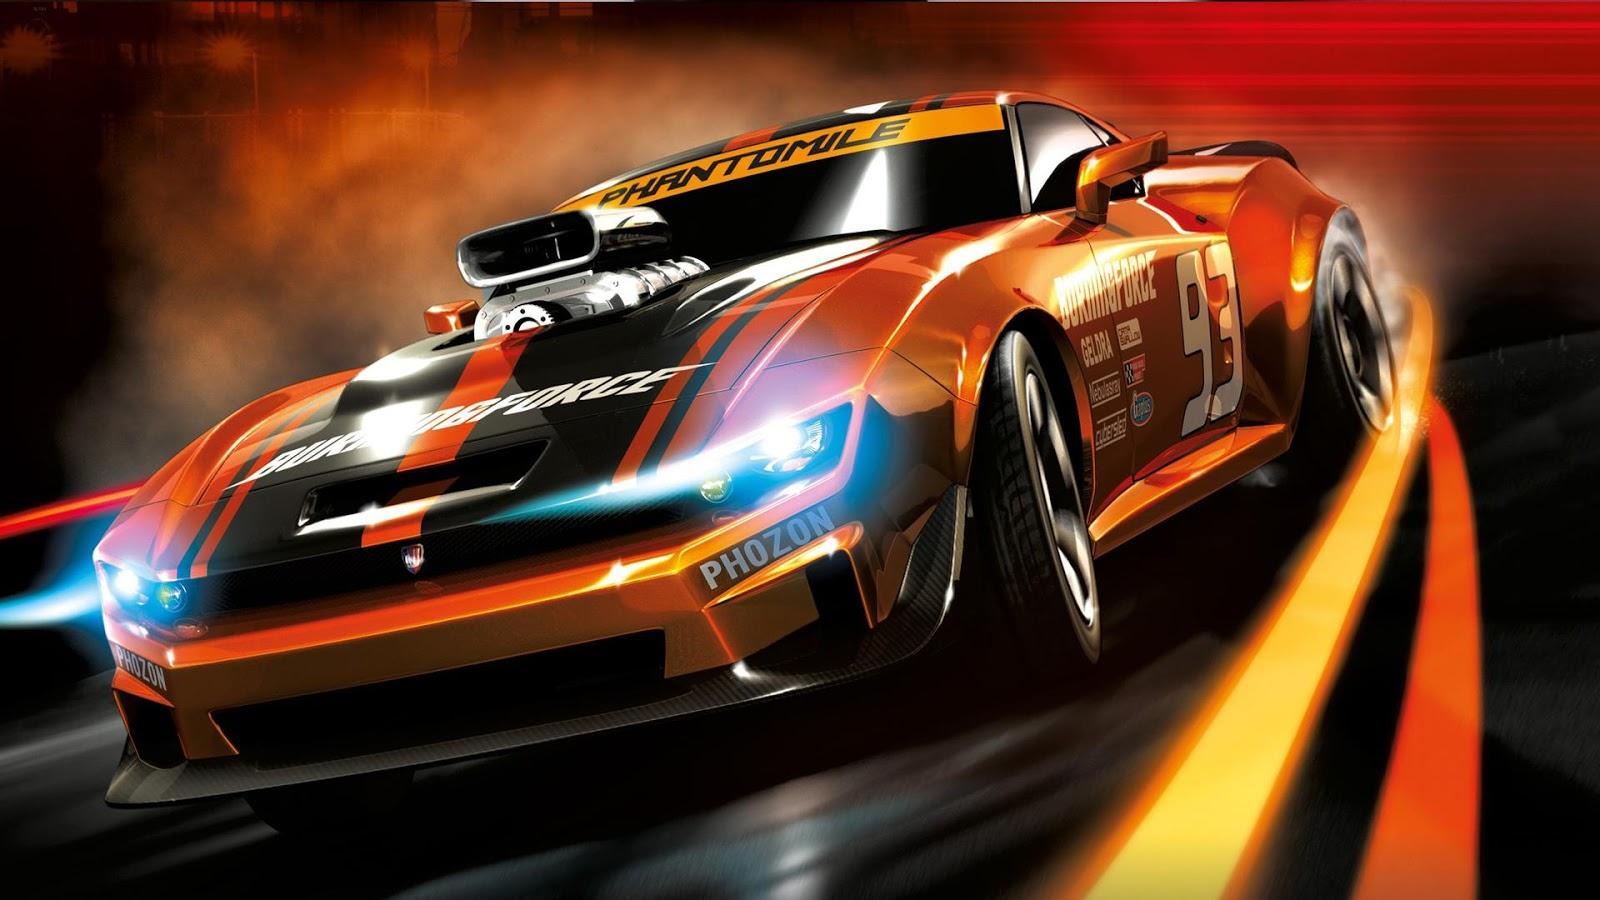 Racing-cars-hd-wallpapers-free